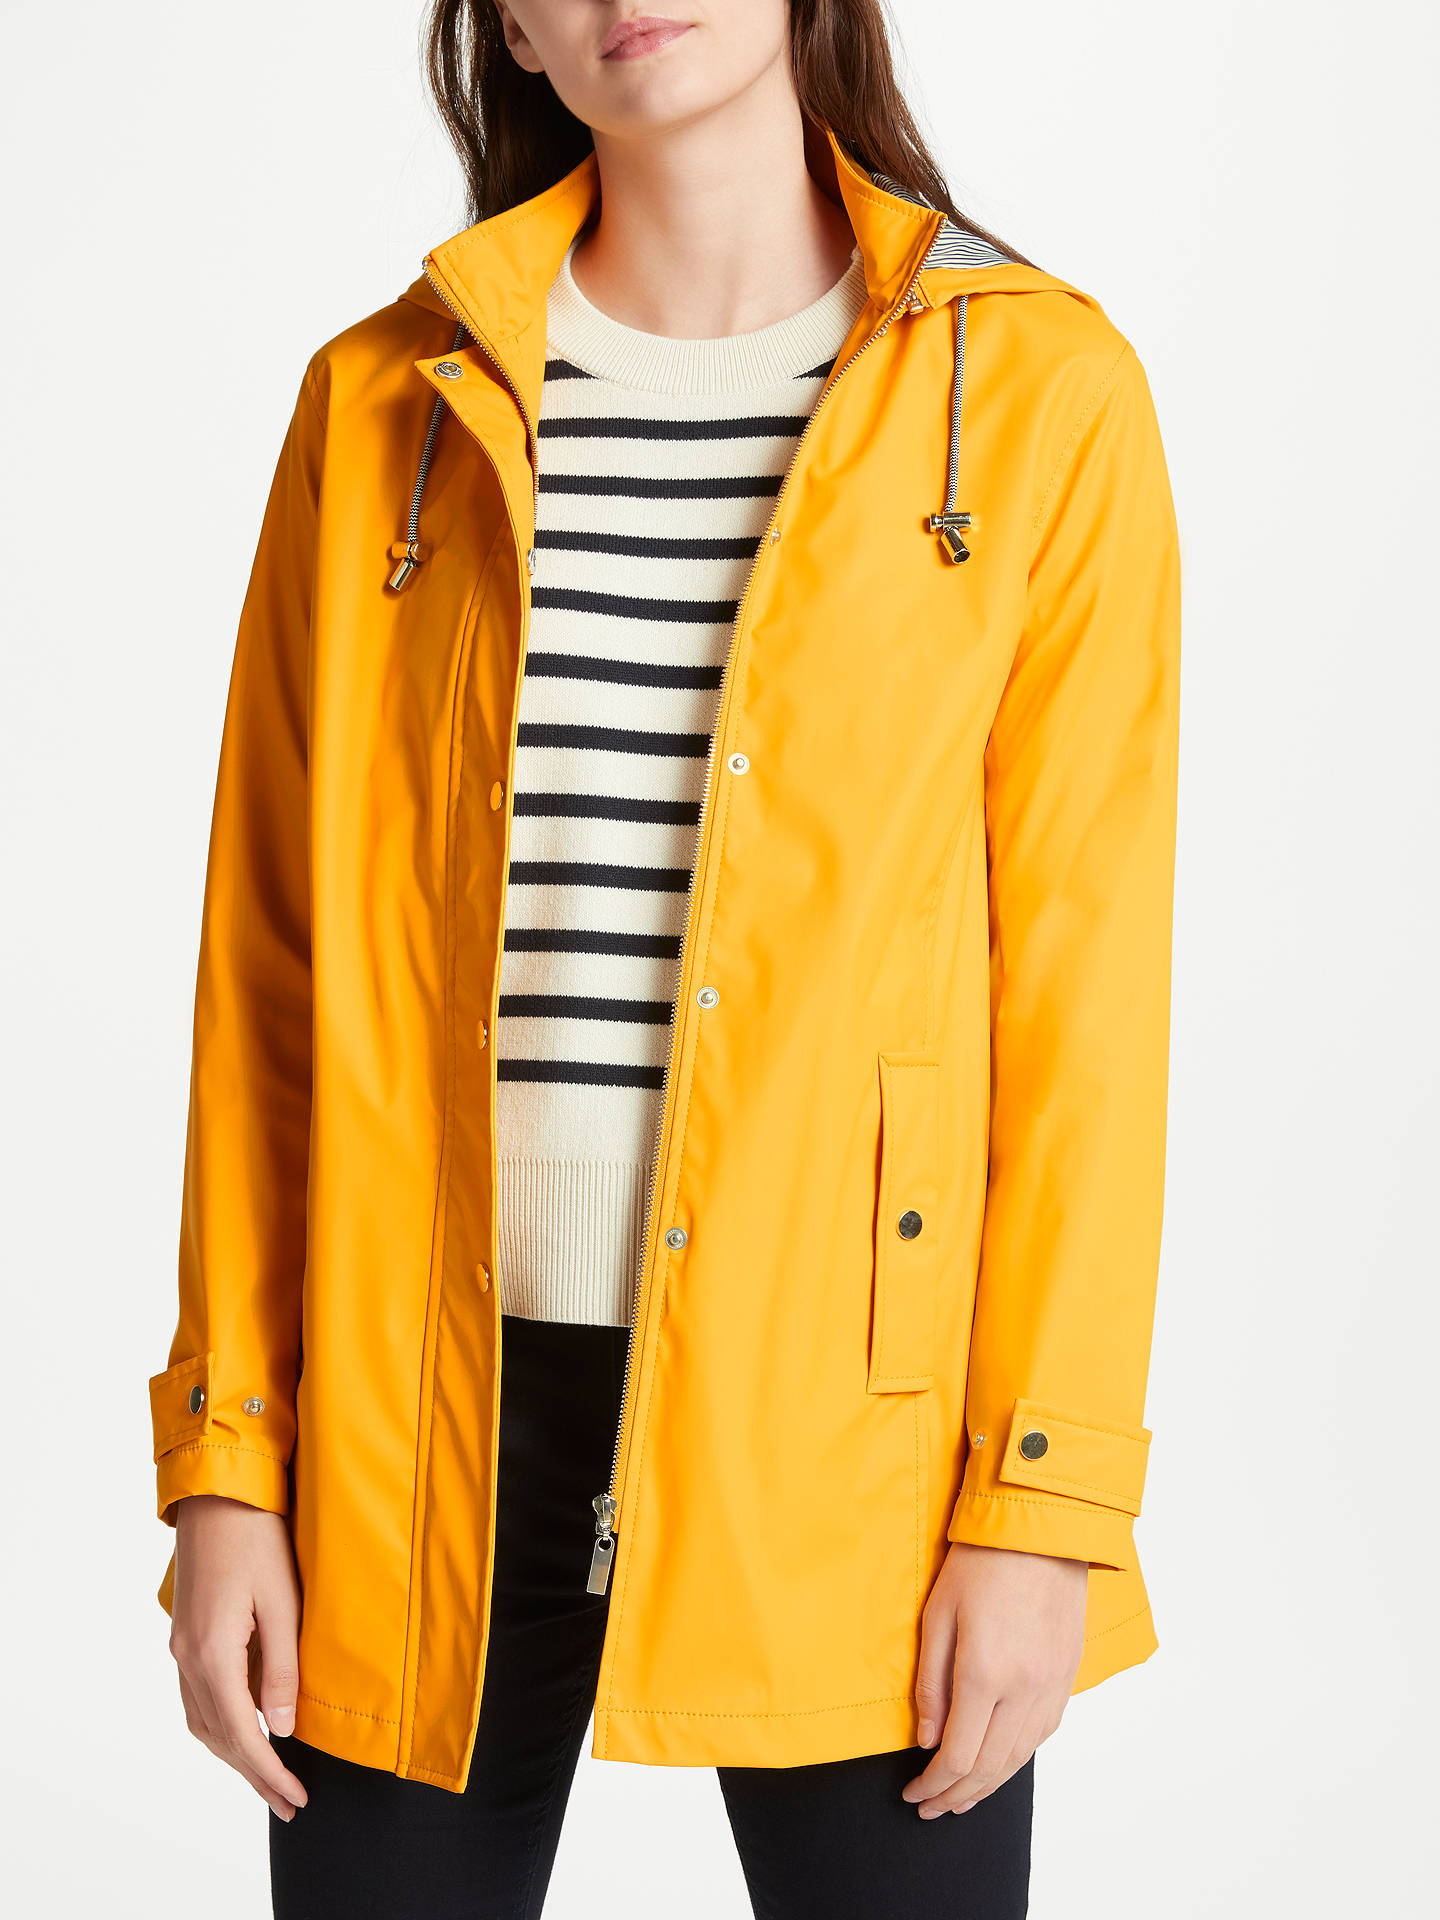 9b3490cef Buy John Lewis Hooded Raincoat, Yellow, 8 Online at johnlewis.com ...